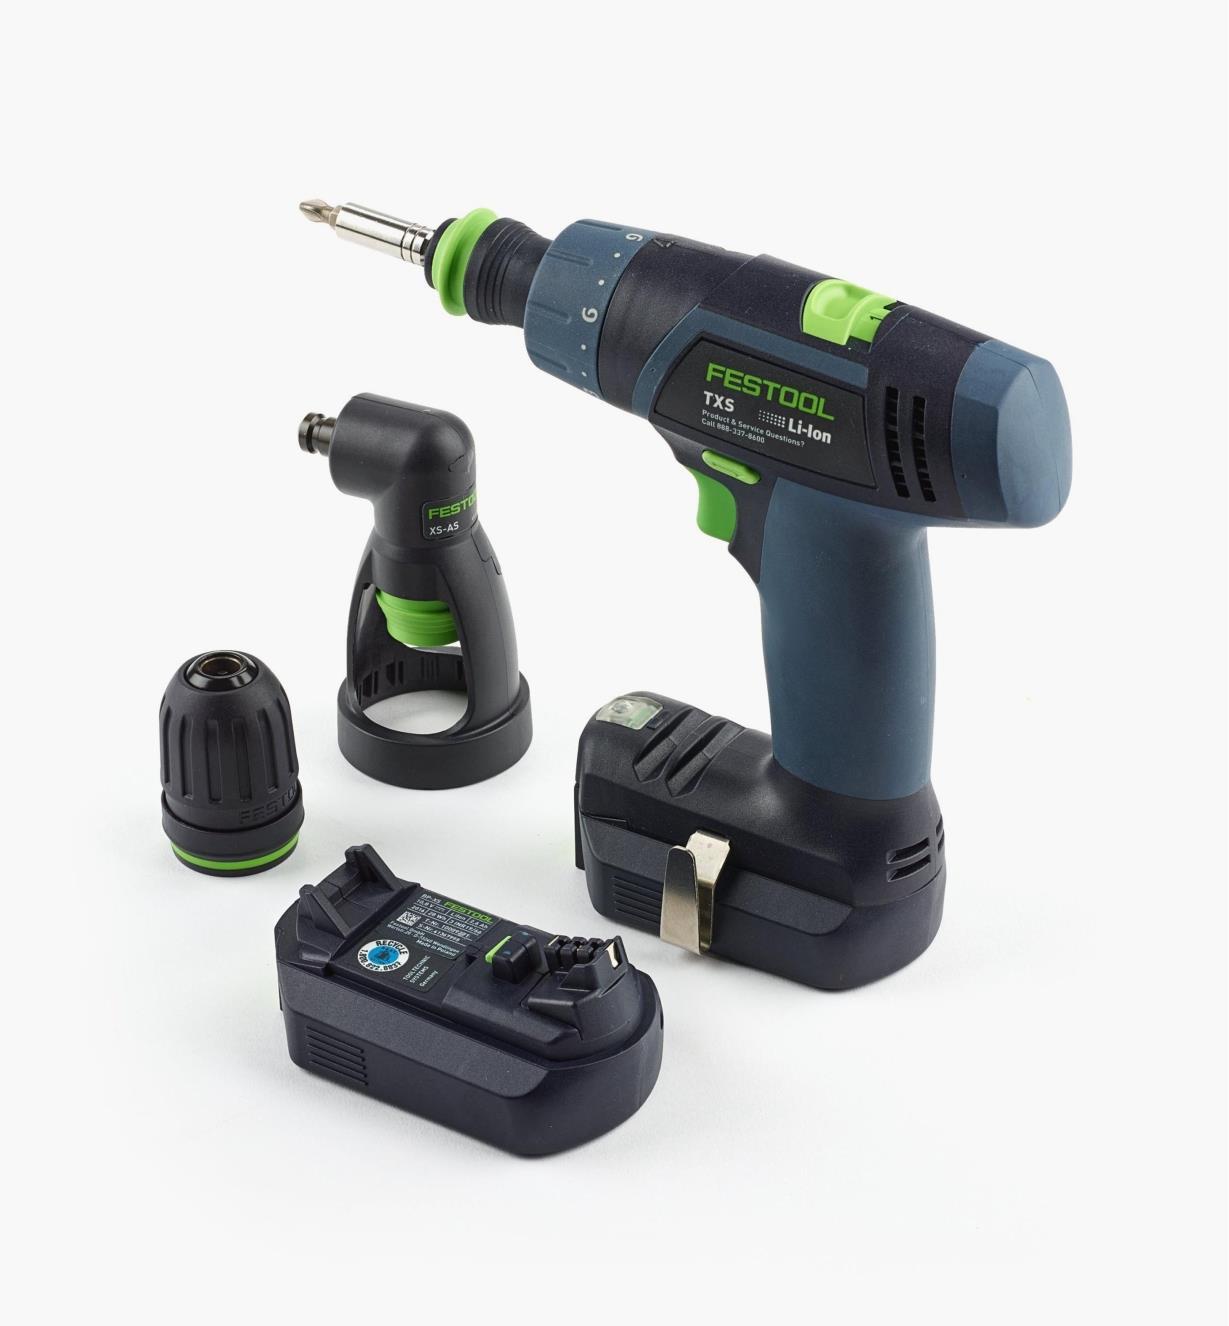 TXS Cordless Drill Set